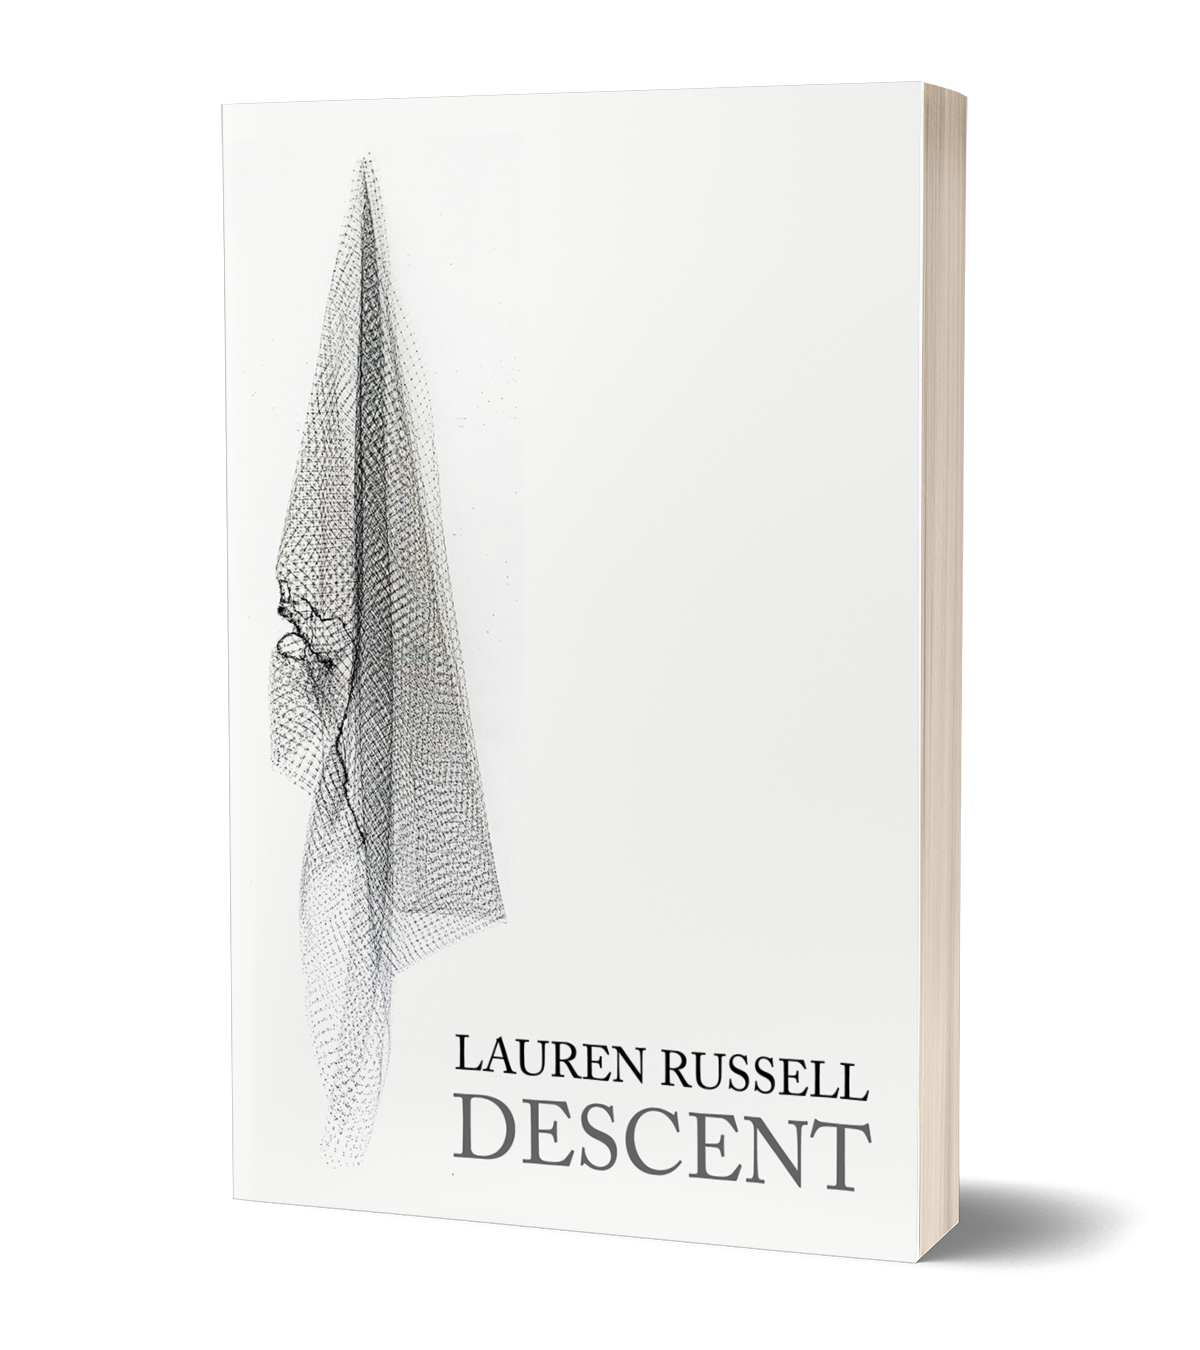 Lauren Russell — Descent book cover image